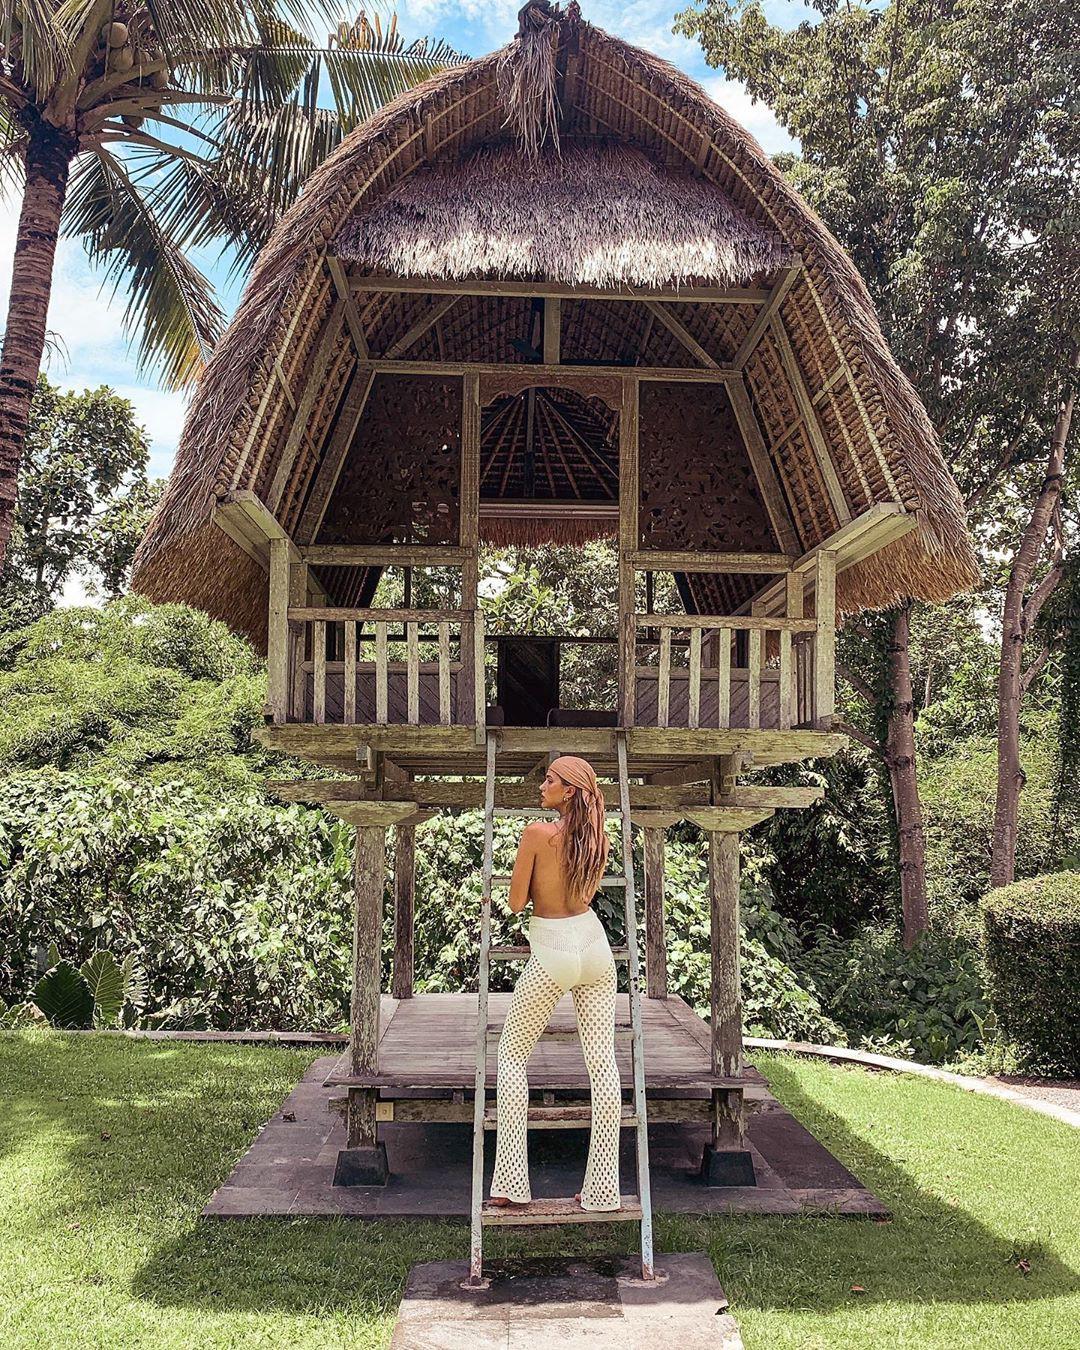 Kara Del Toro, plantation, building, botany